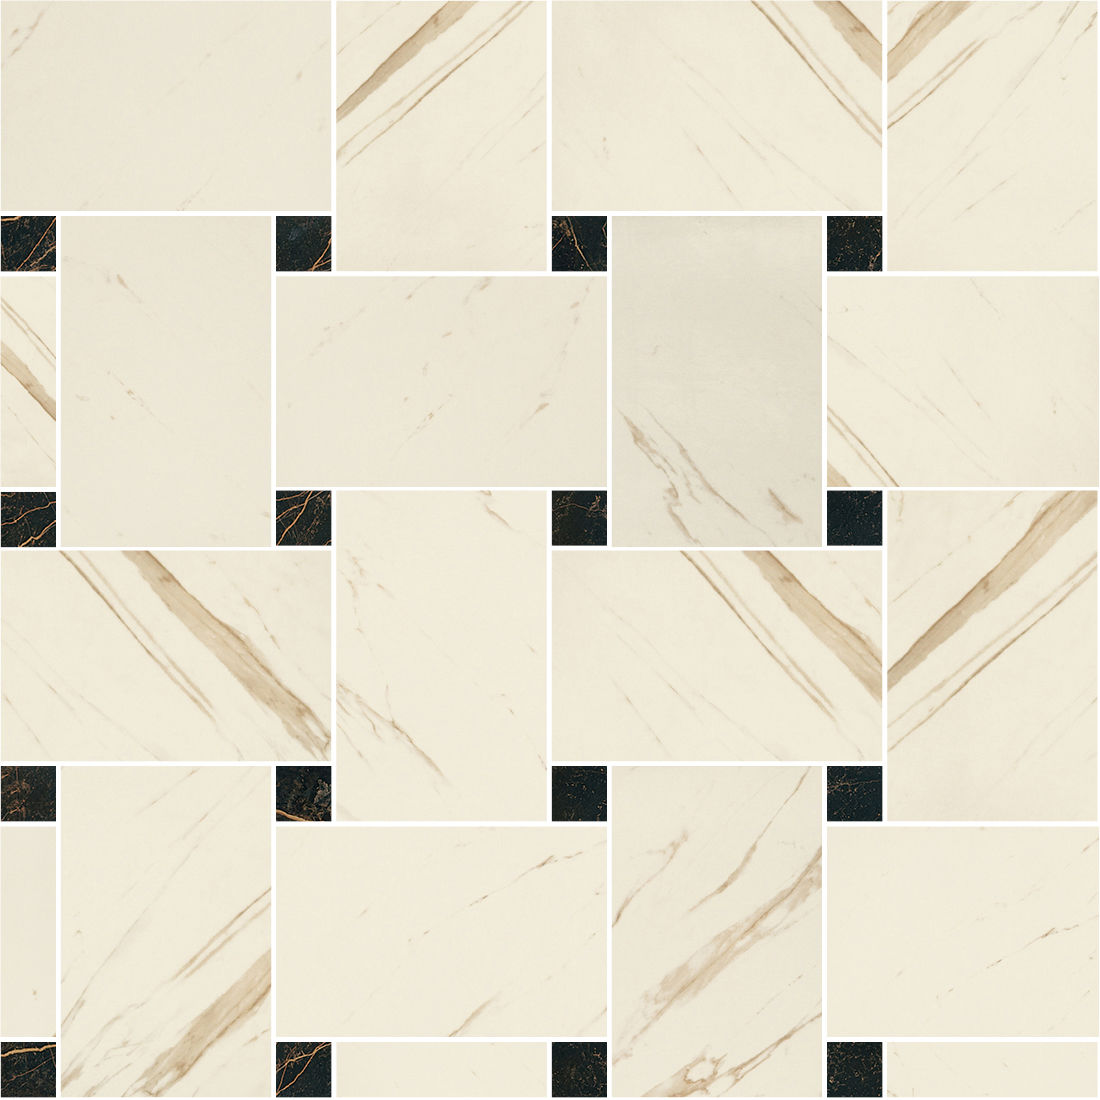 Купить Керамогранит Versace Marble Bianco 240531 Mosaics Intrec. Bianco-Nero Nat/Lap мозаика 29, 1х29, 1, Италия